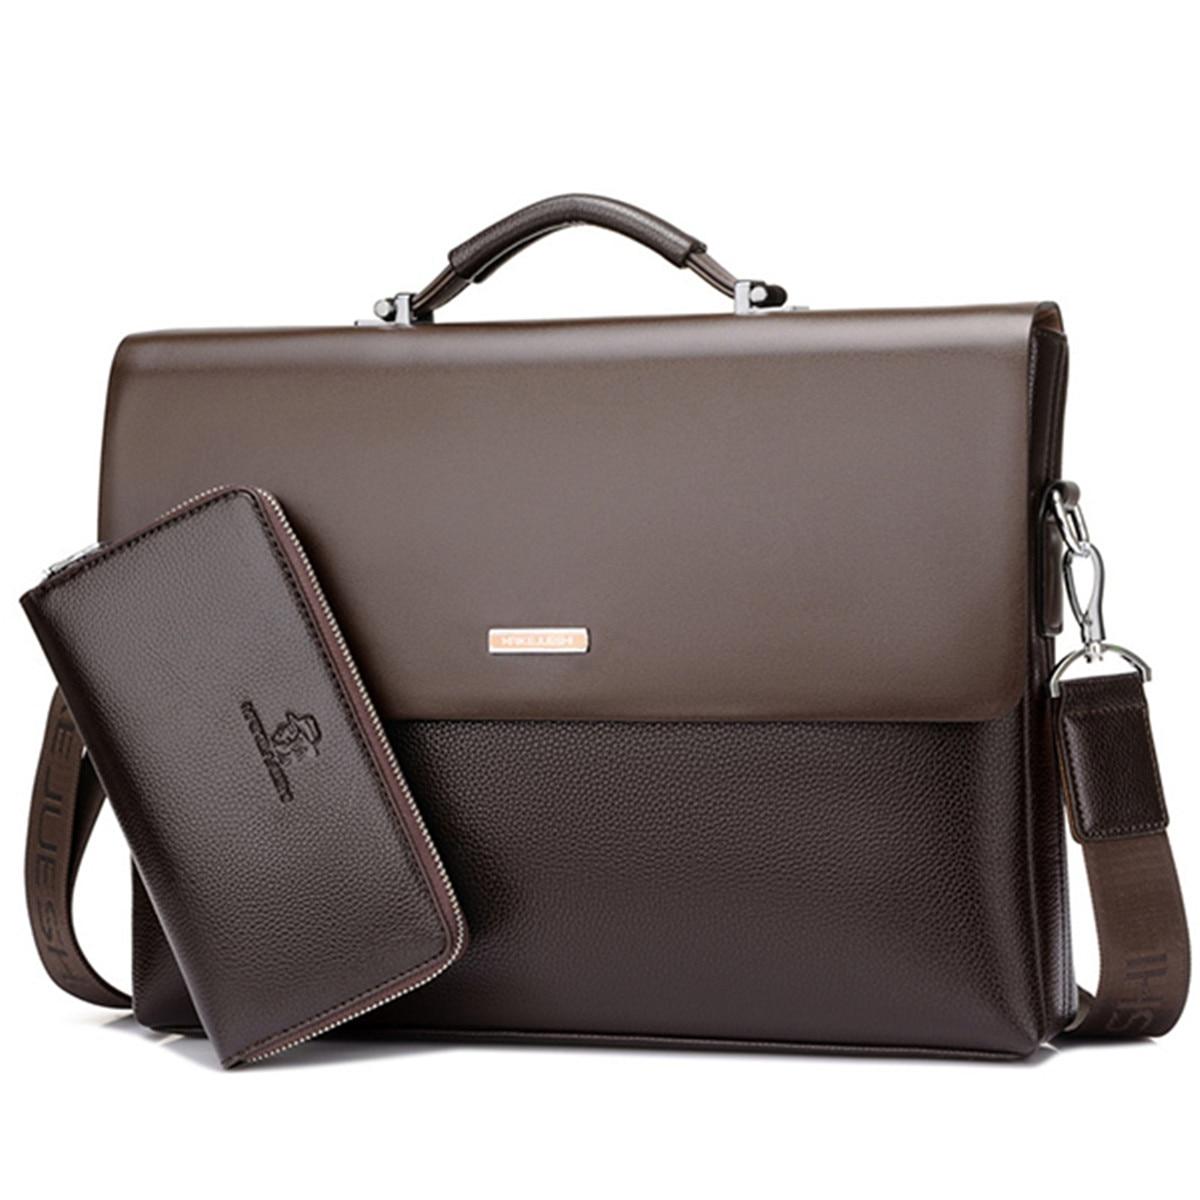 2019 Fashion Split Leather Men Briefcase Laptop Bag Business Bag 2pcs Set Handbag Office Casual Man Tote Shoulder Bags +Wallet